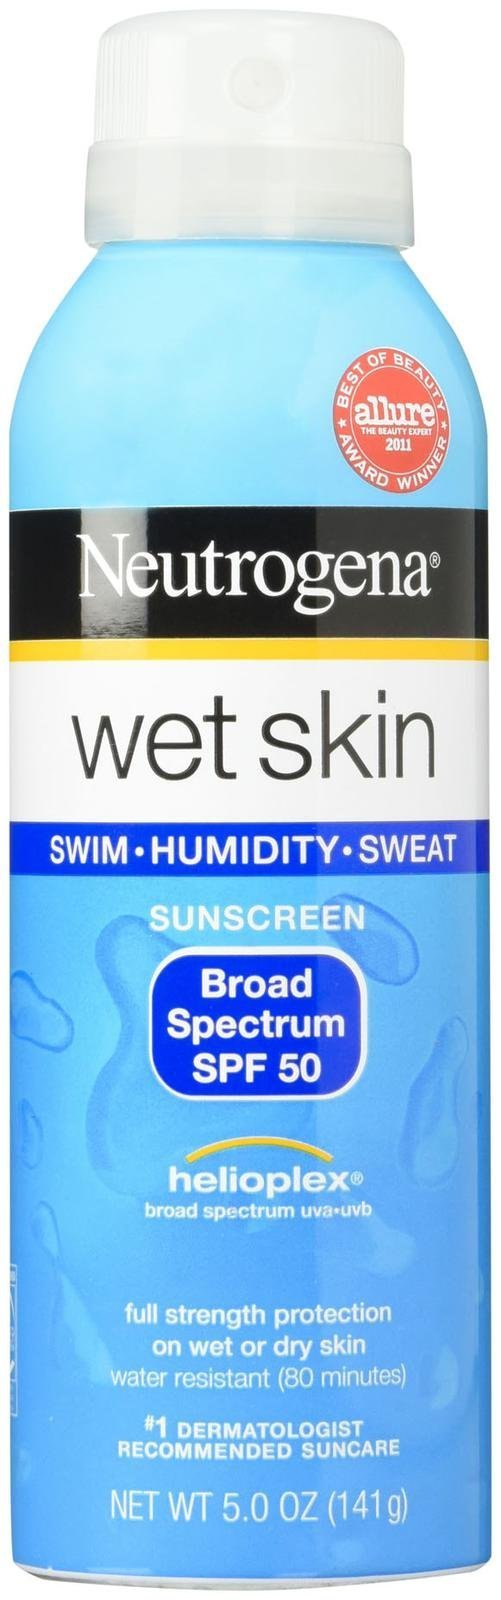 Neutrogena Wet Skin Sunscreen Spray SPF 50 5 oz